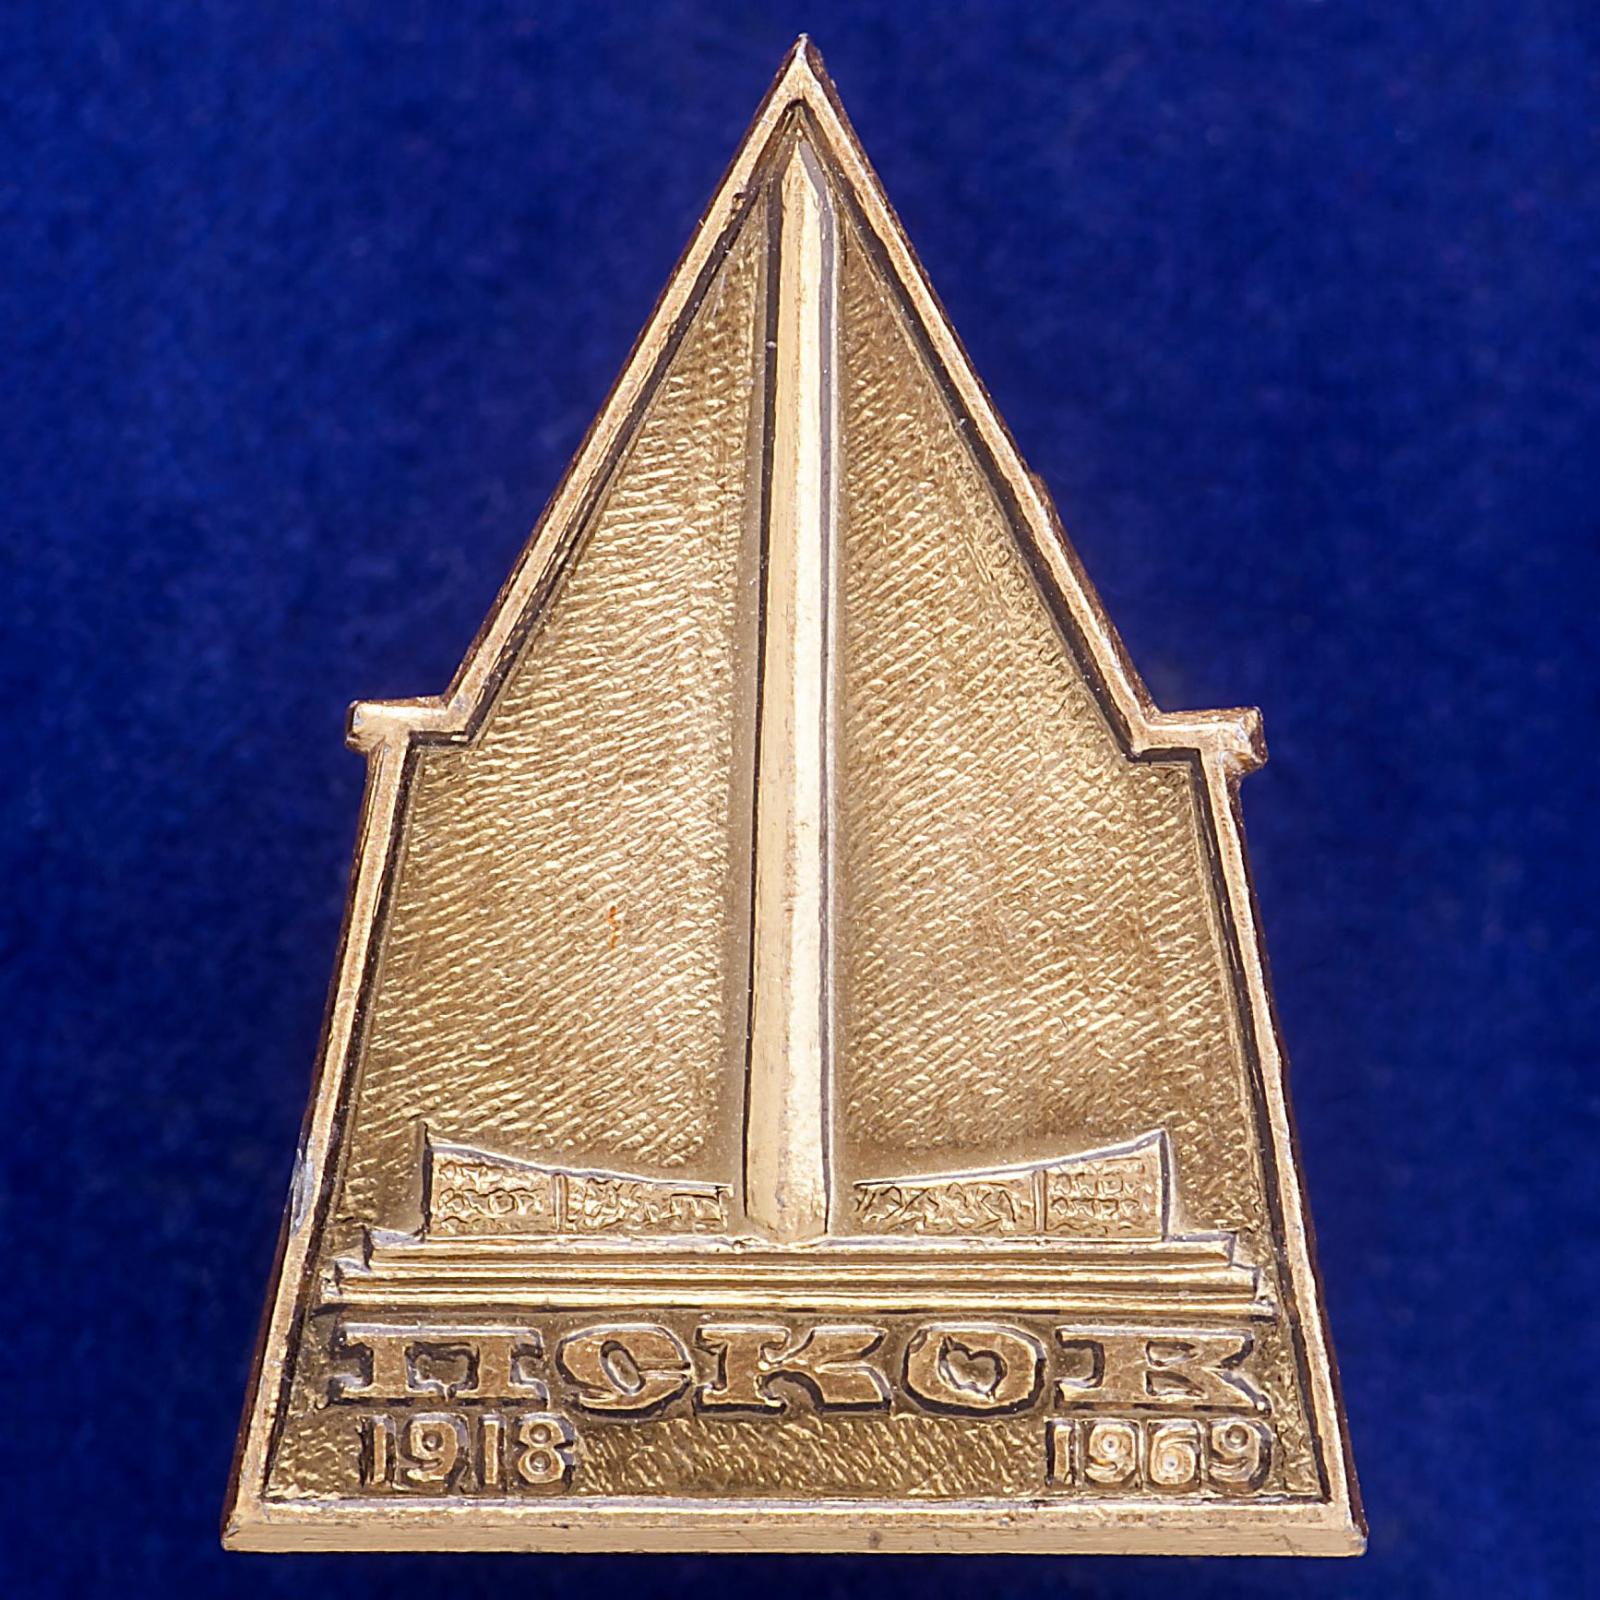 Значок Стелла в Пскове